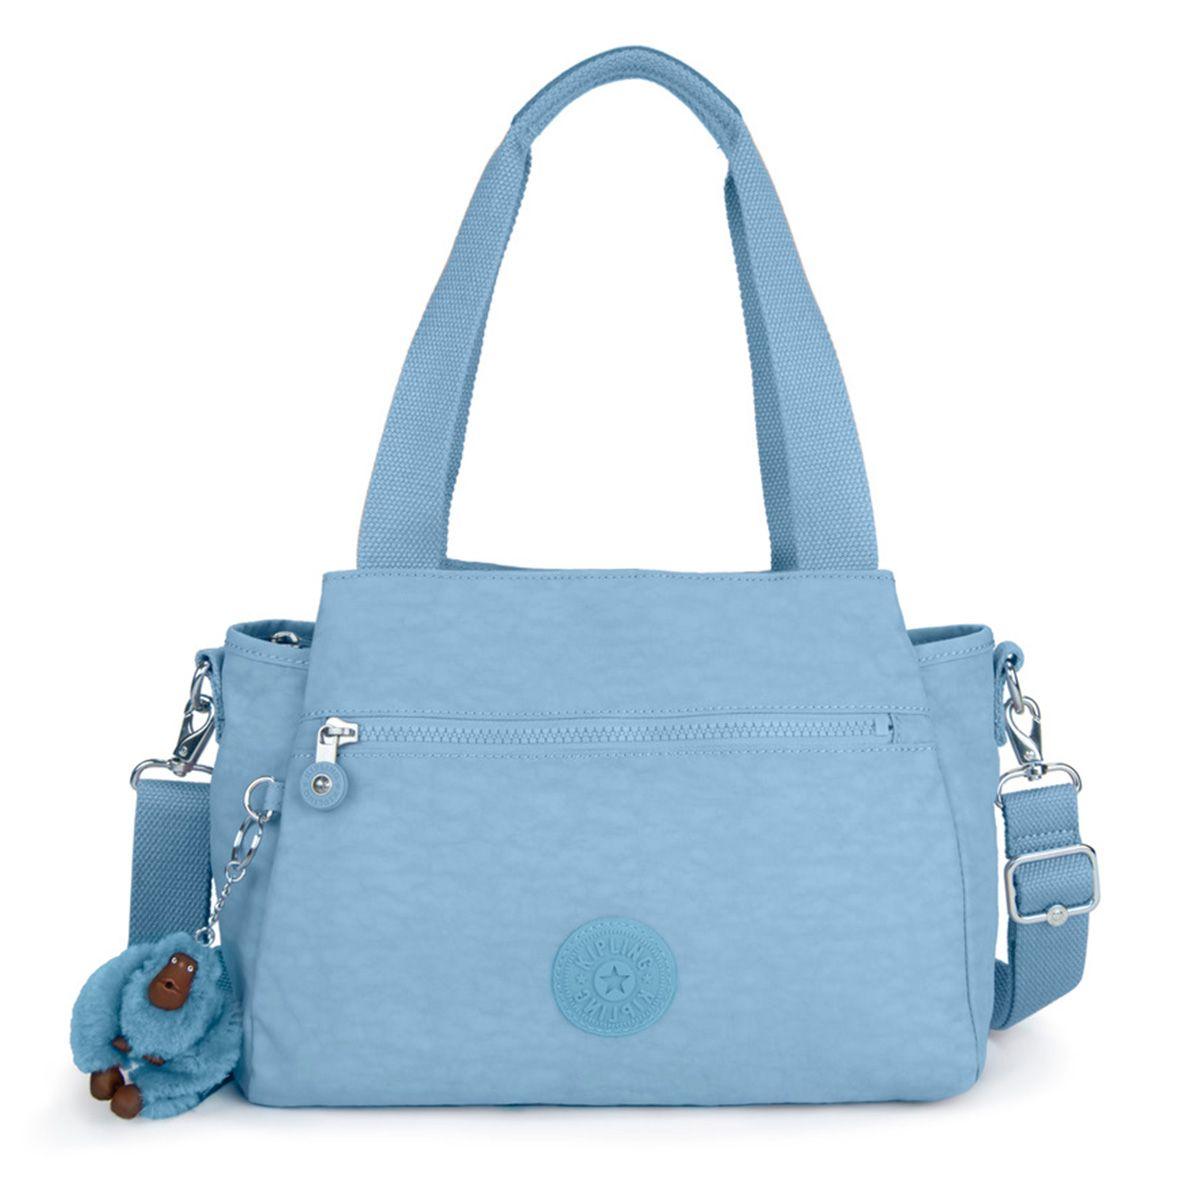 a5b8a6d04be0 Kipling Handbags